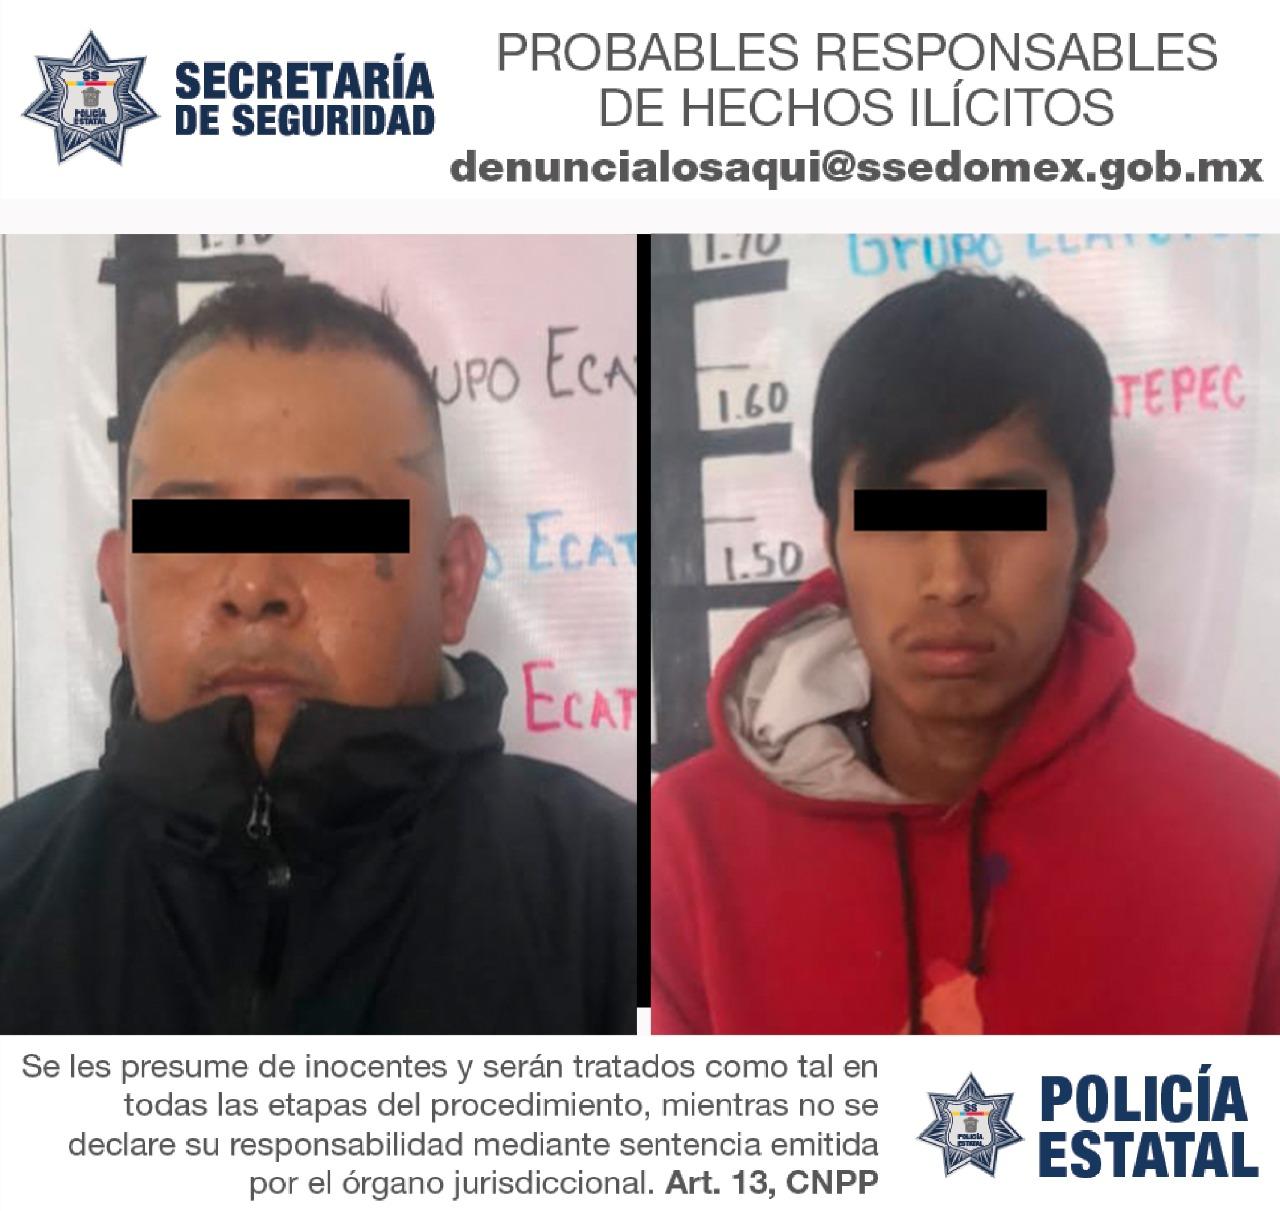 Detienen en flagrancia a dos probables responsables de robo con violencia a transporte público